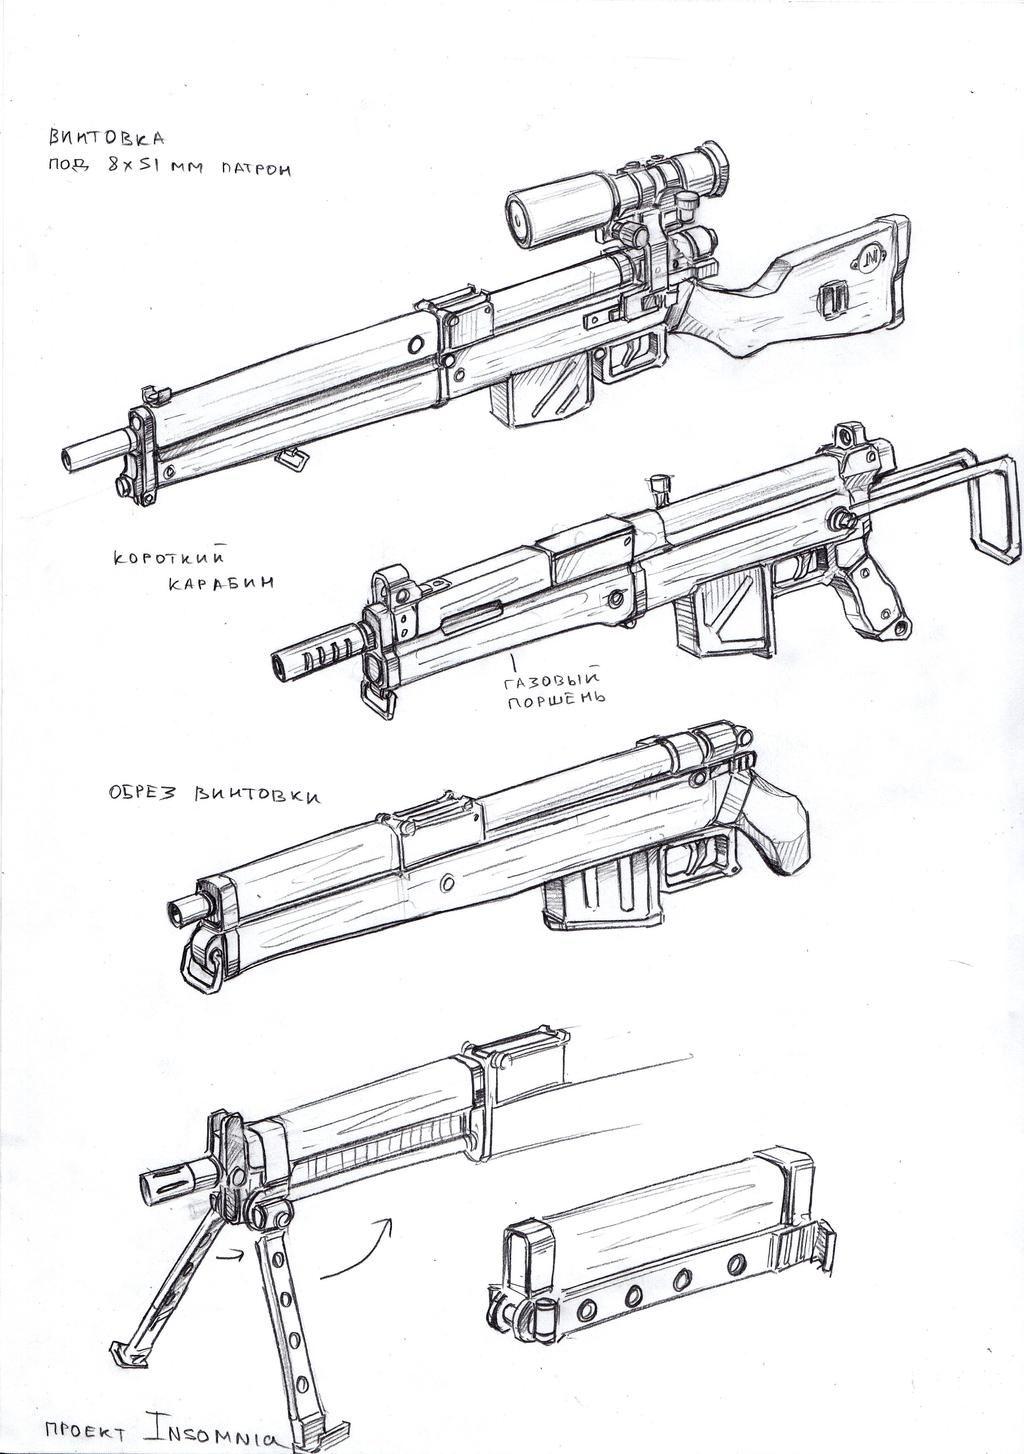 Weapons 24 By Tugodoomer On Deviantart